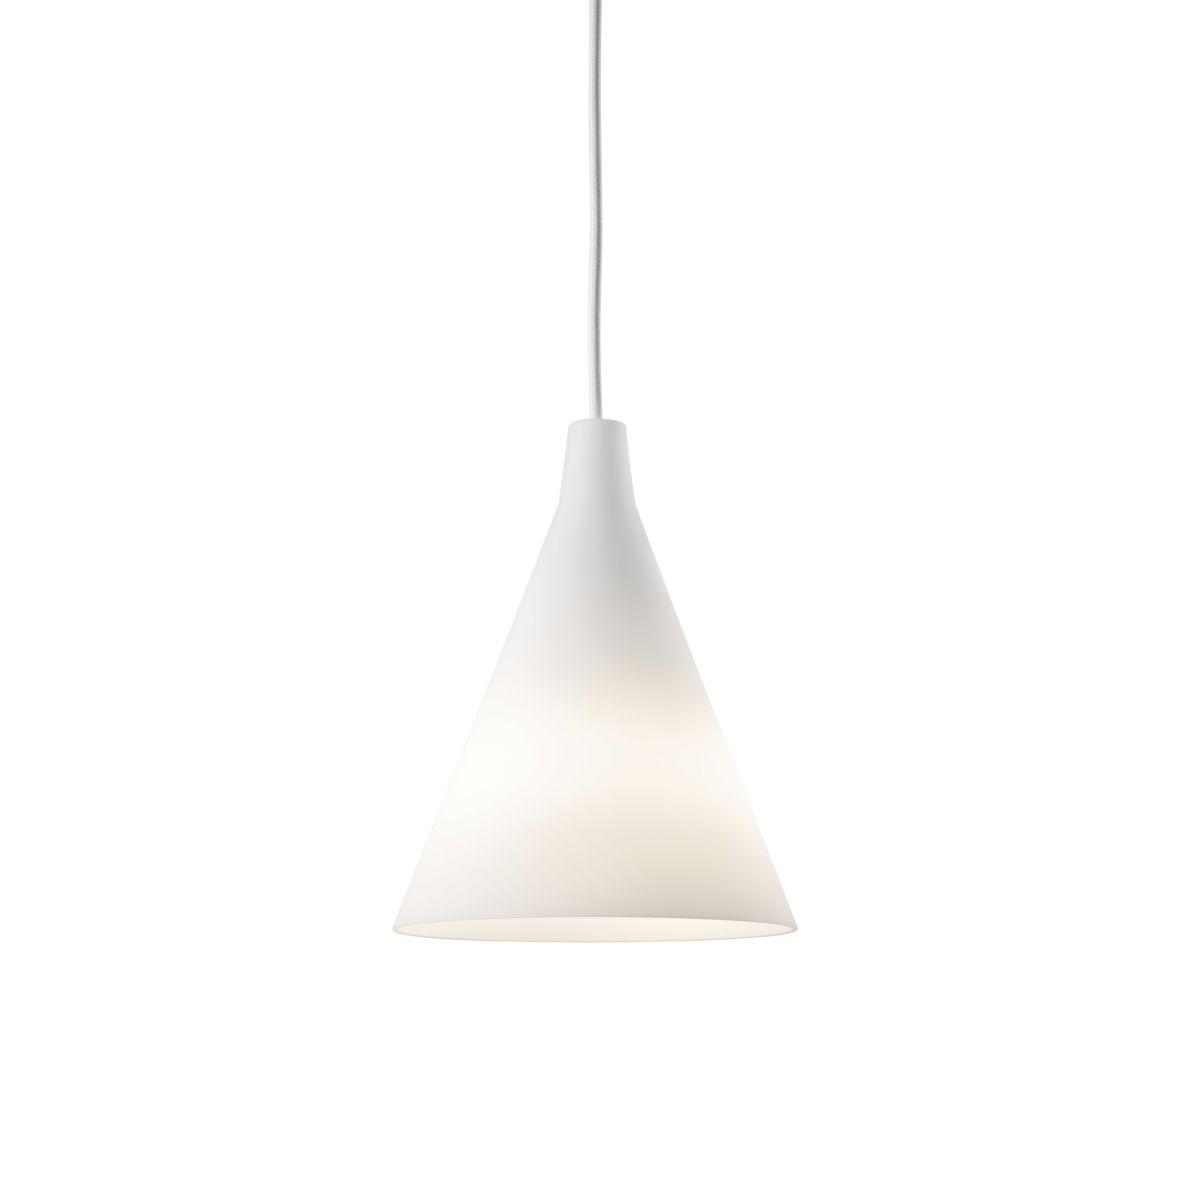 Pendant-Light-Tw002-_Triennale__On_Web-1977973